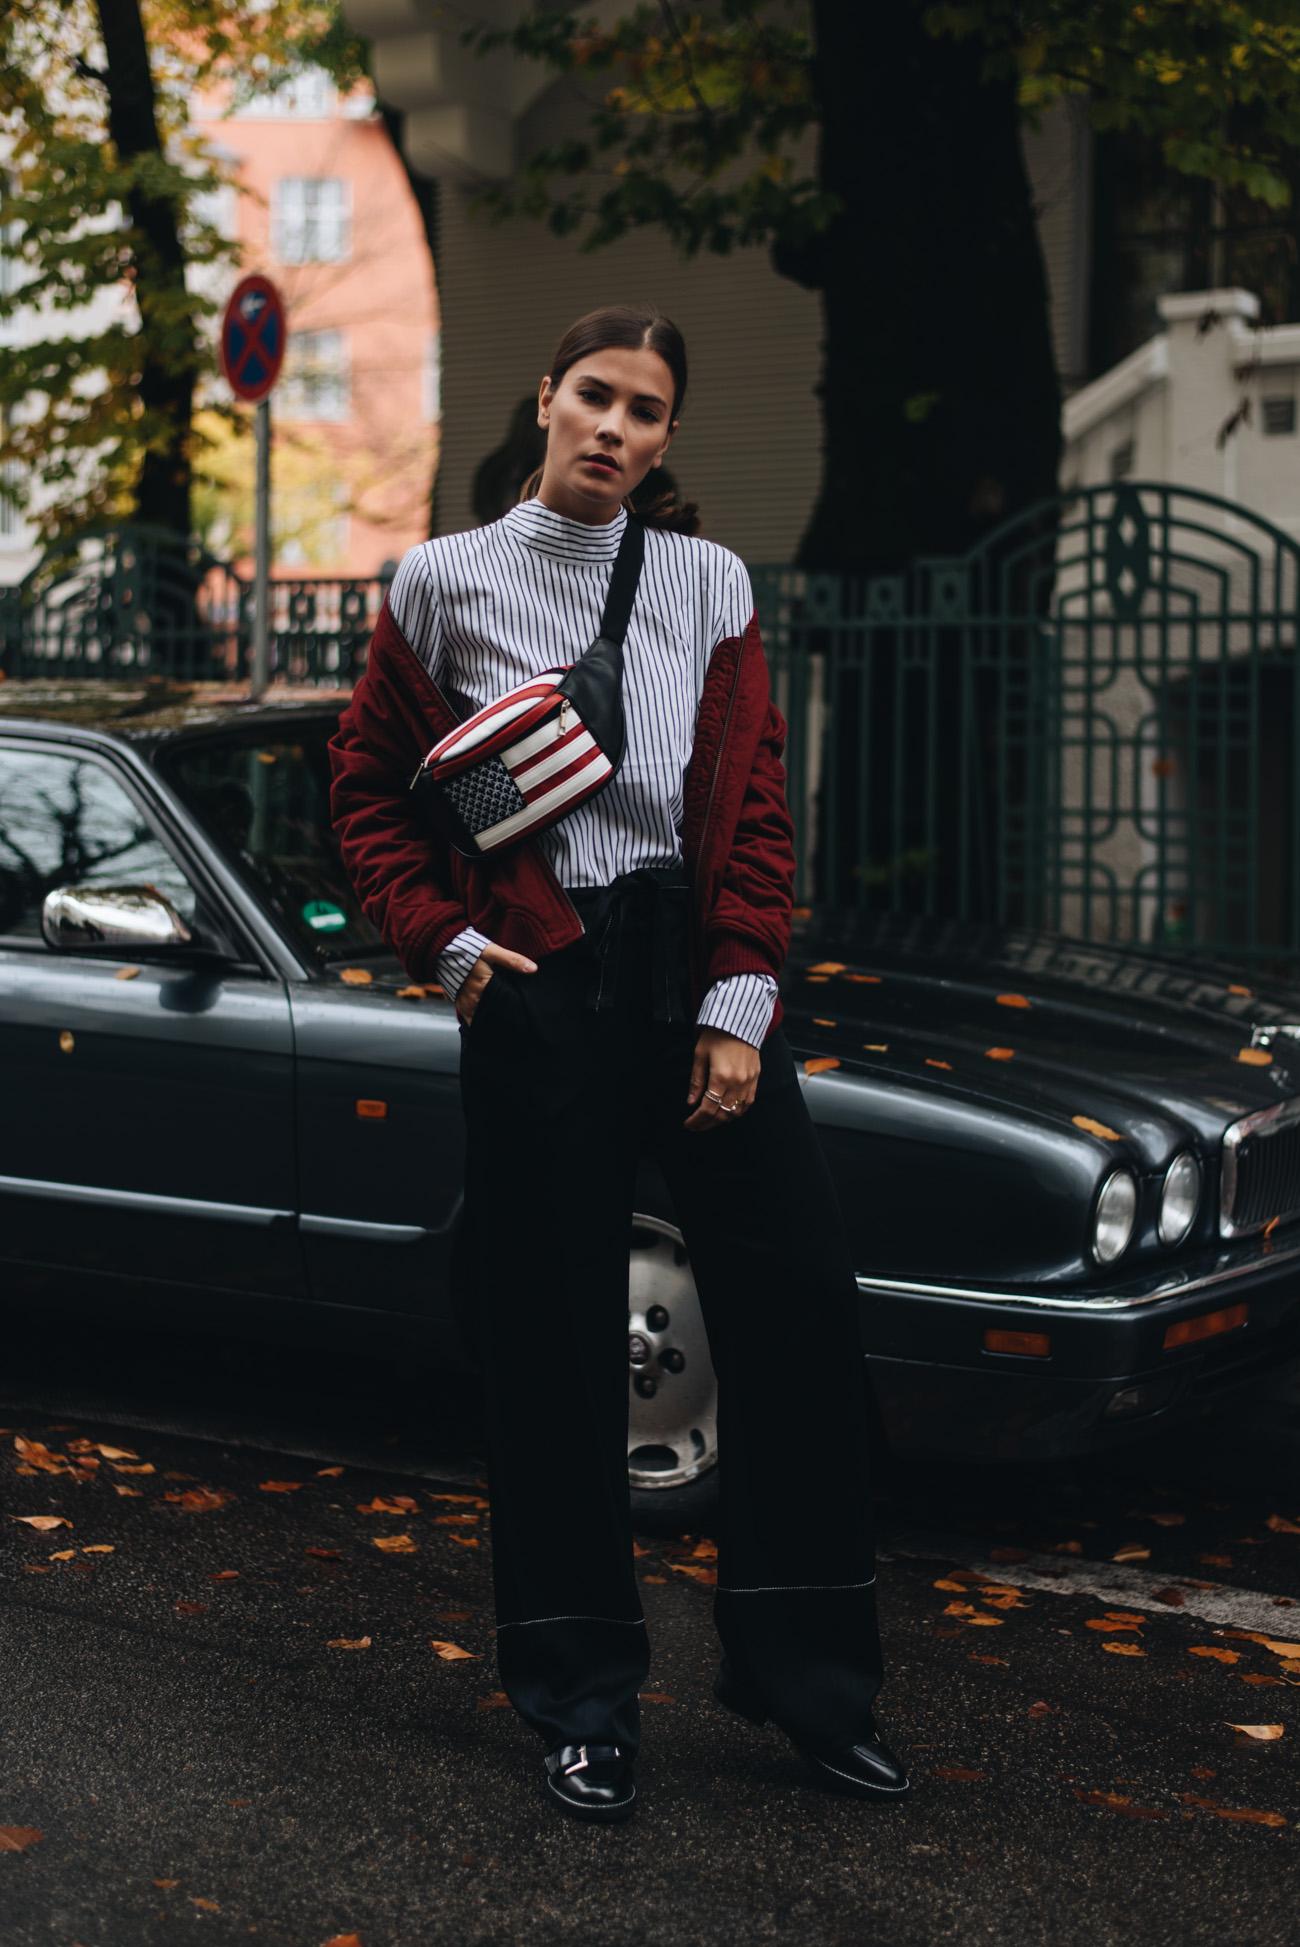 mode-bloggerin-nina-schwichtenberg-streetstyle-mode-trends-herbst-winter-2017-fashiioncarpet